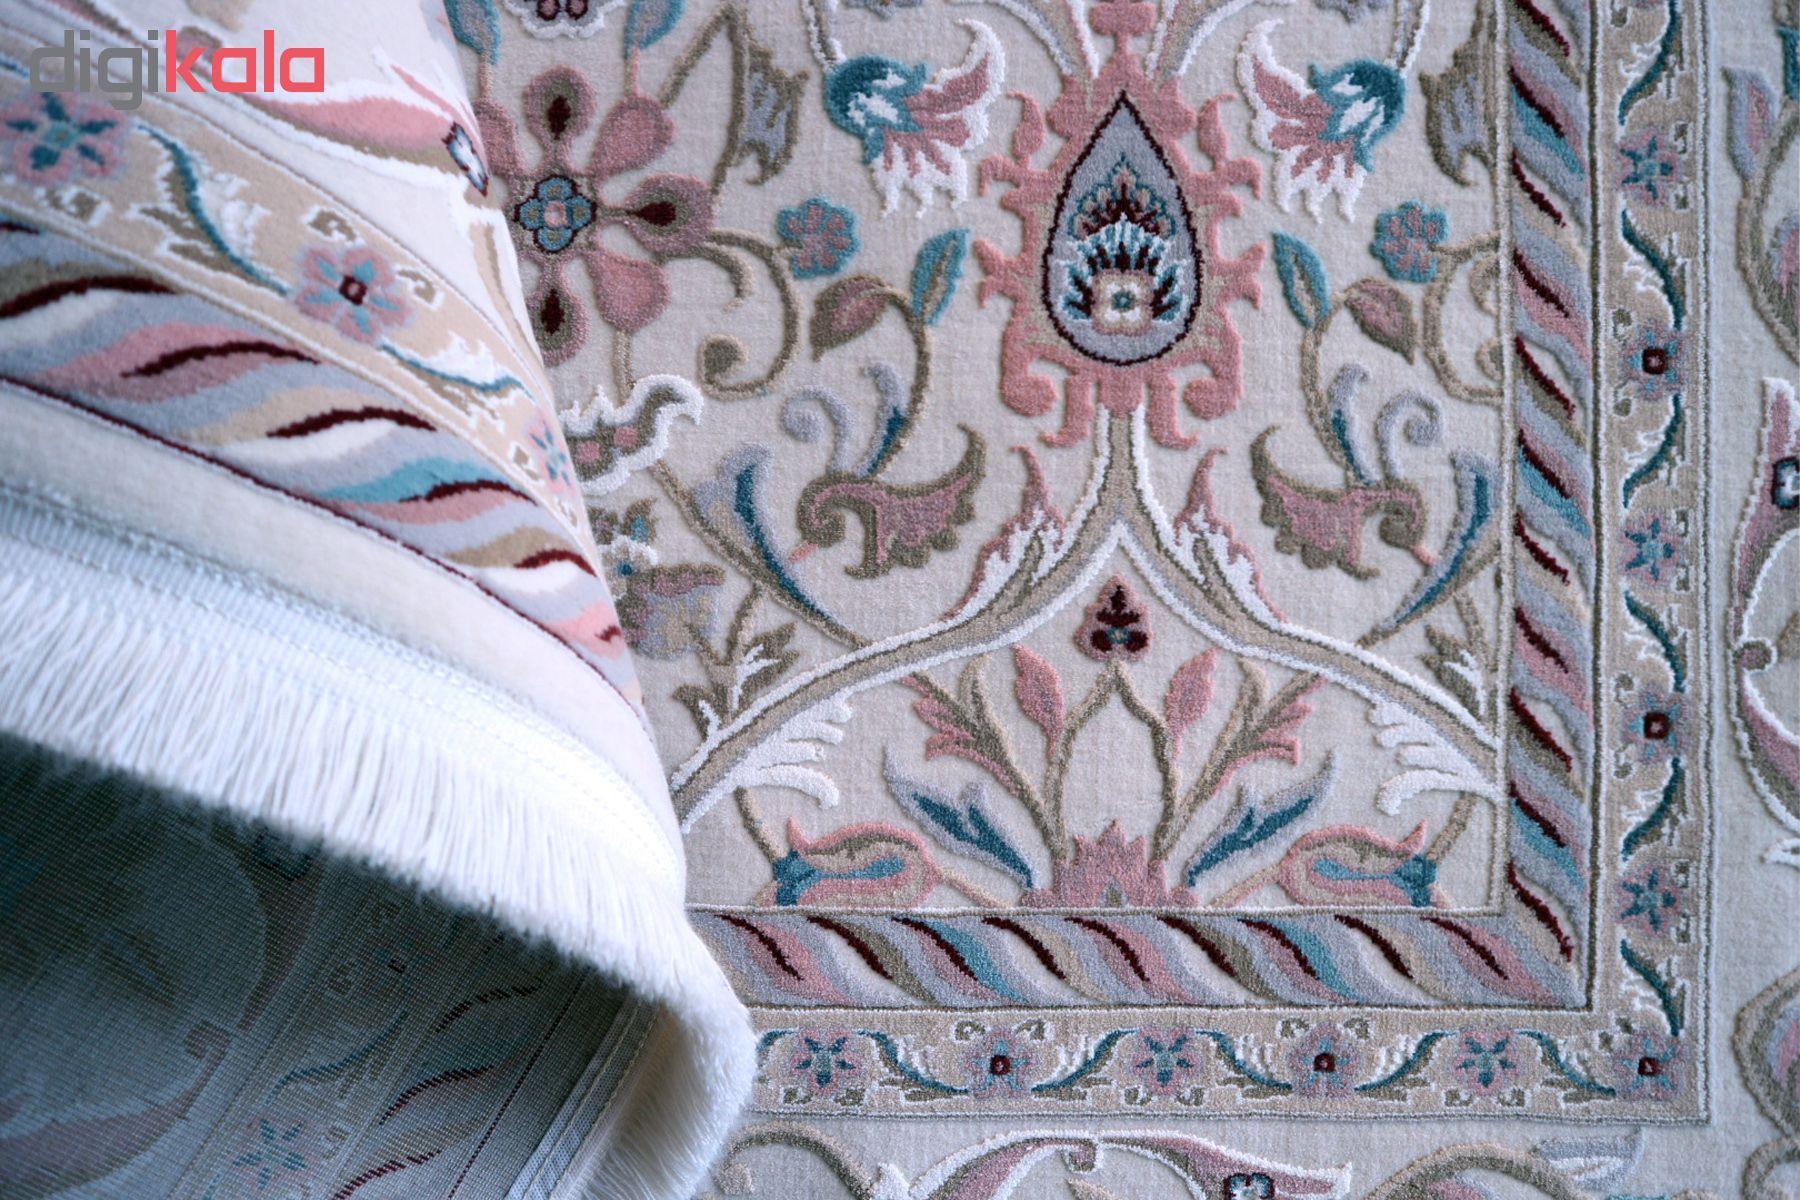 فرش ماشینی فرش رادین طرح آنتیک 2 آرامش صدفی